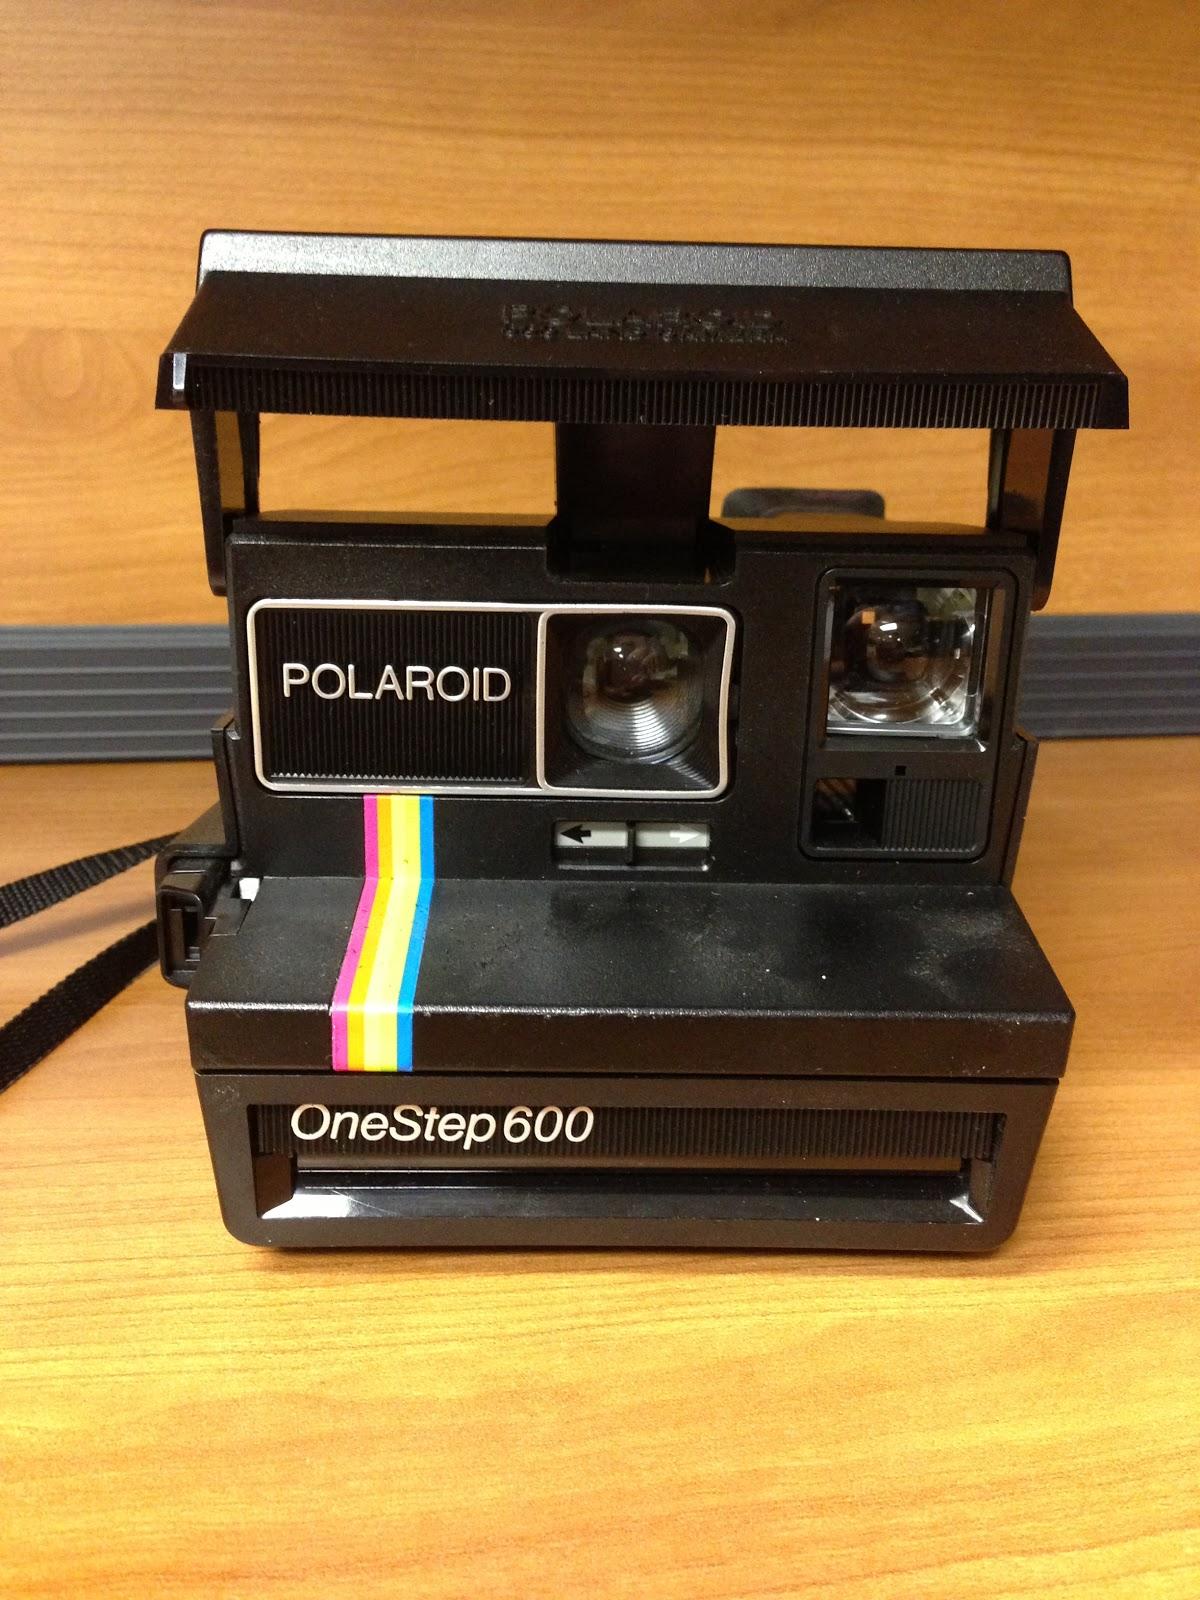 retro educational technology the polaroid instant camera. Black Bedroom Furniture Sets. Home Design Ideas